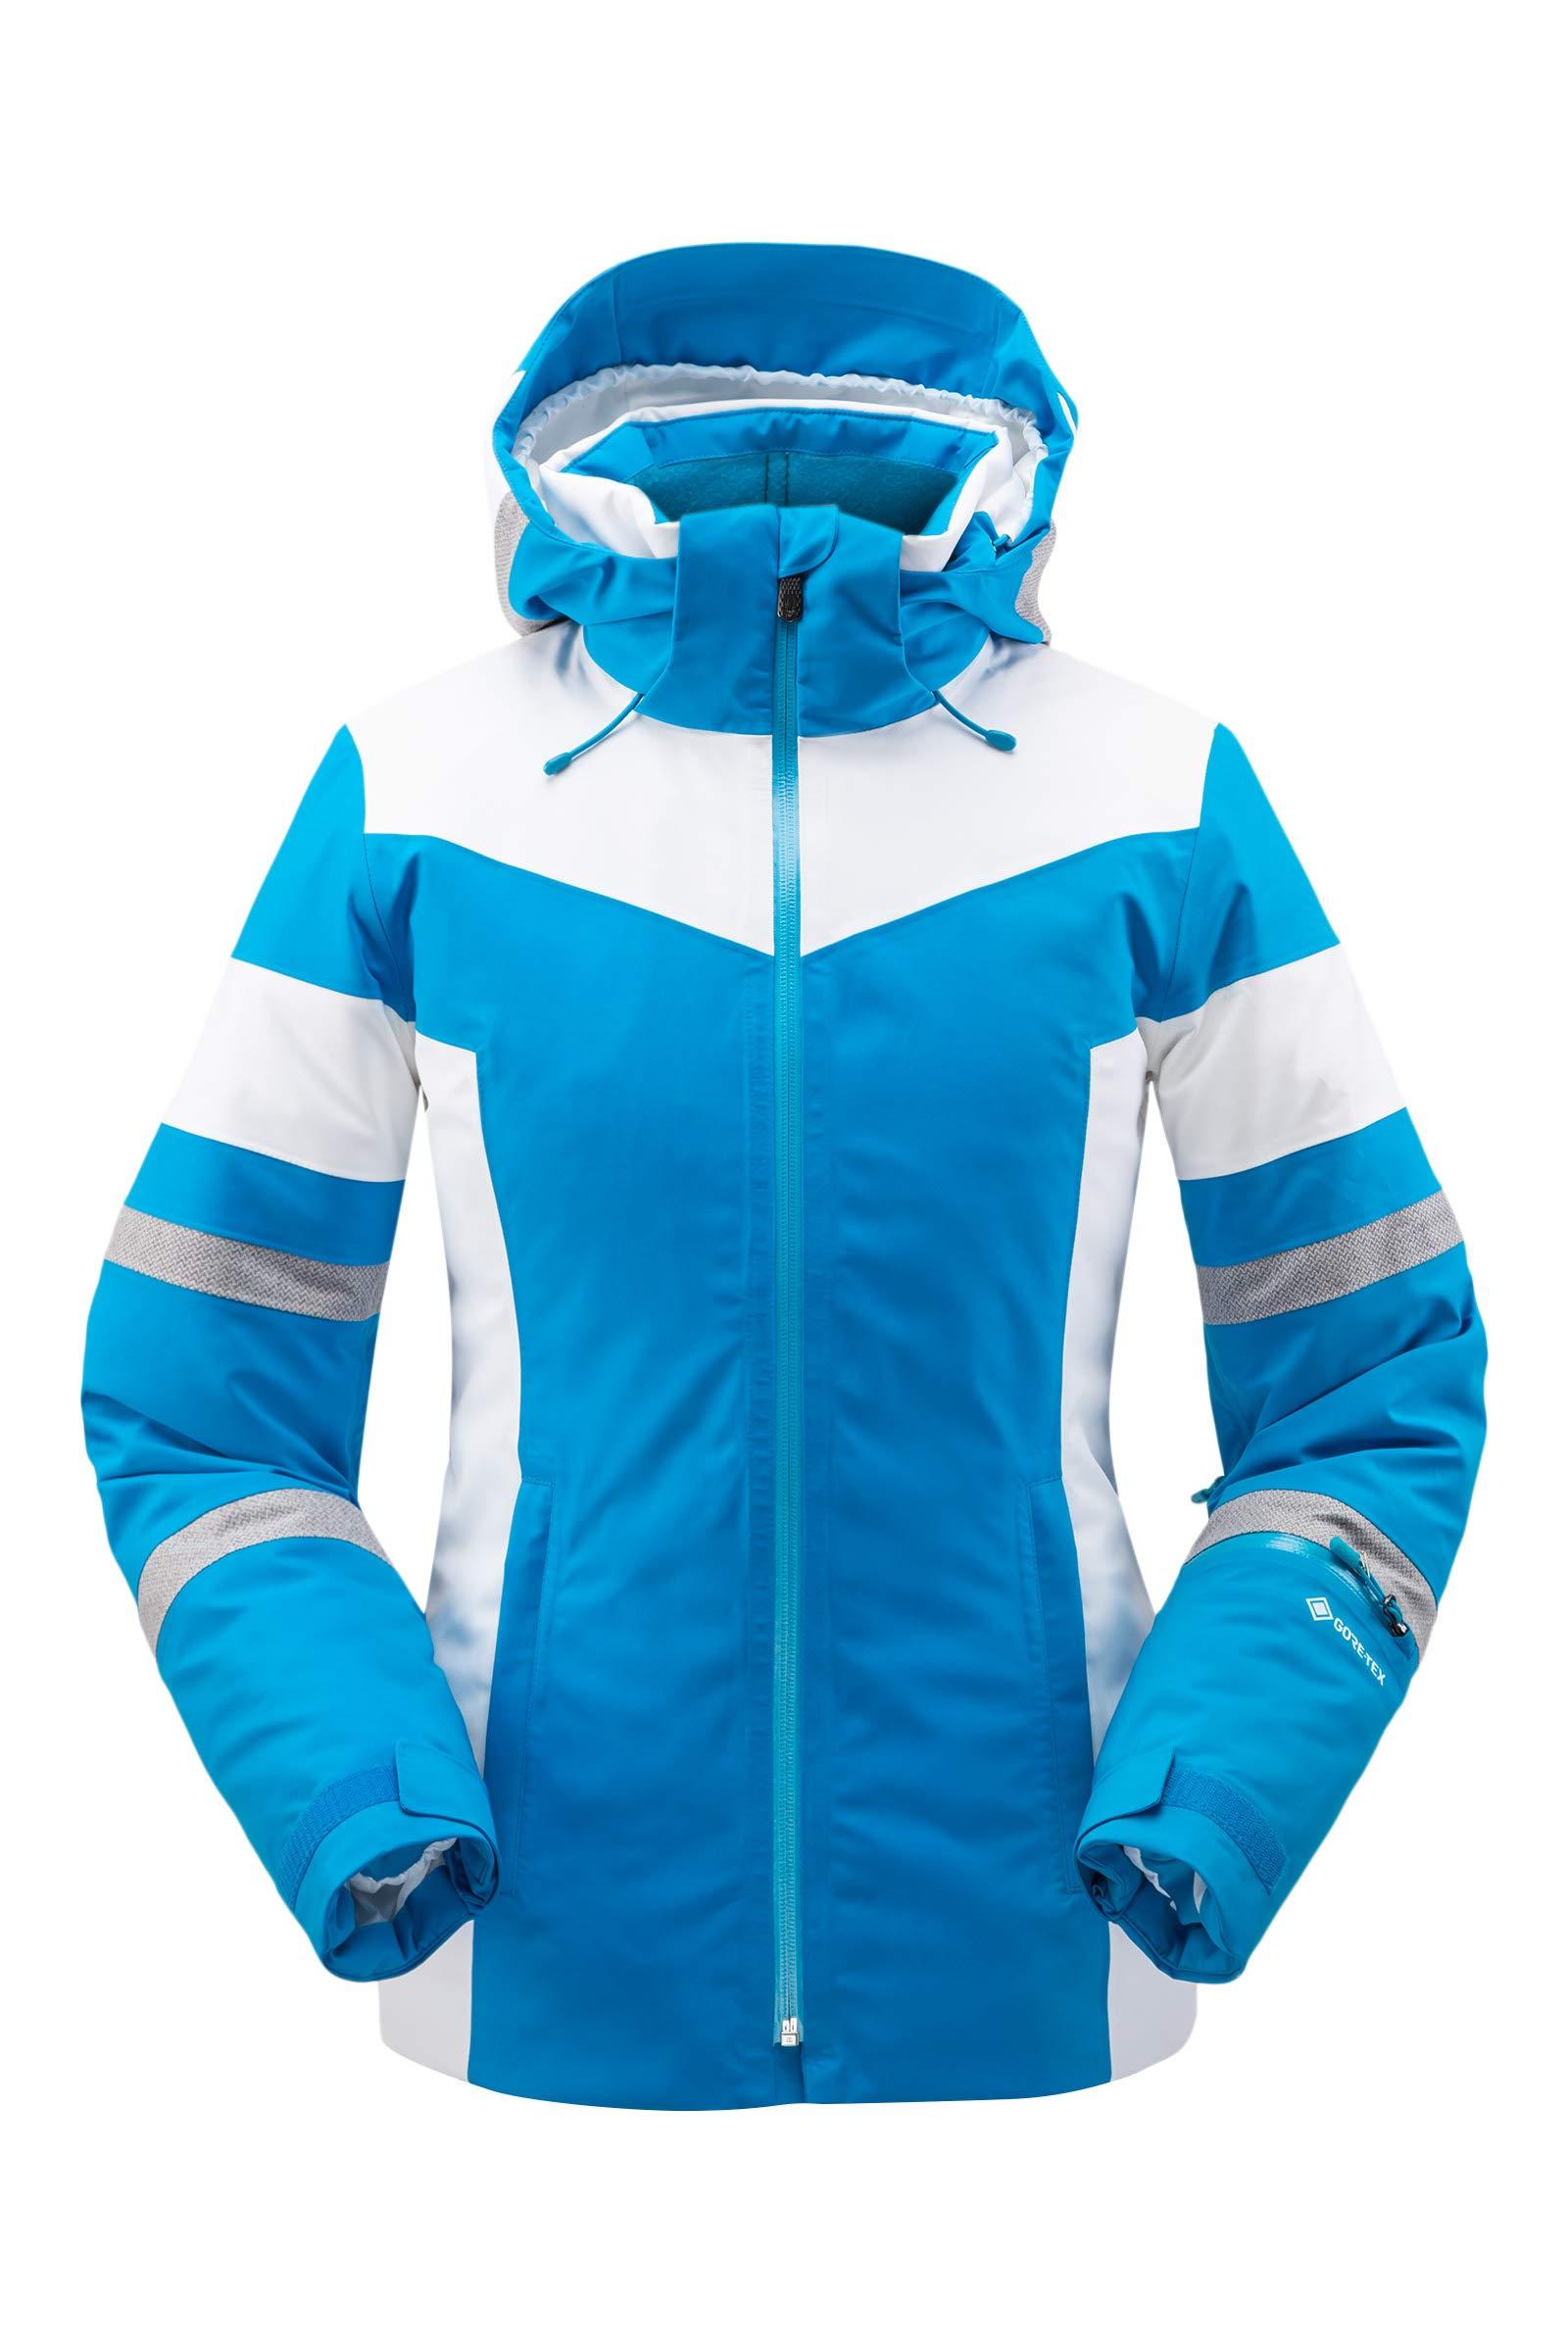 Spyder Women's Captivate Gore-Tex Ski Jacket – Ladies Full-Zip Hooded Winter Coat